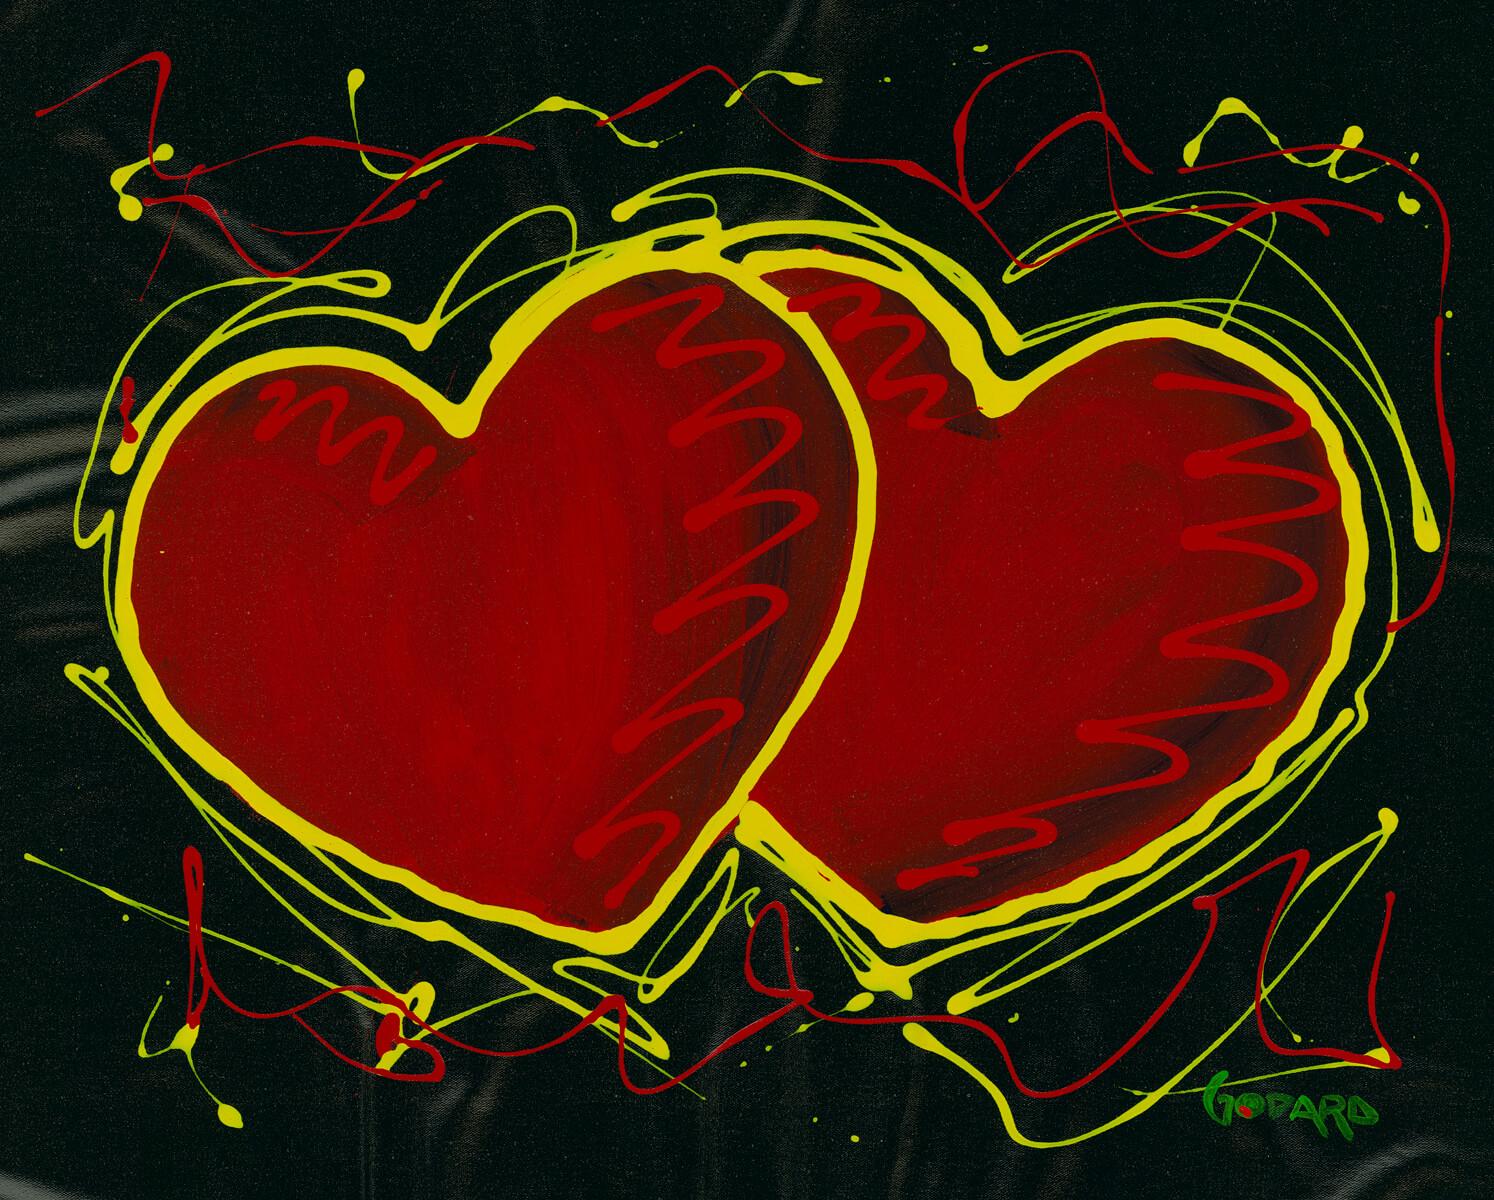 """Hearts for Hope"" (2016) Michael Godard"